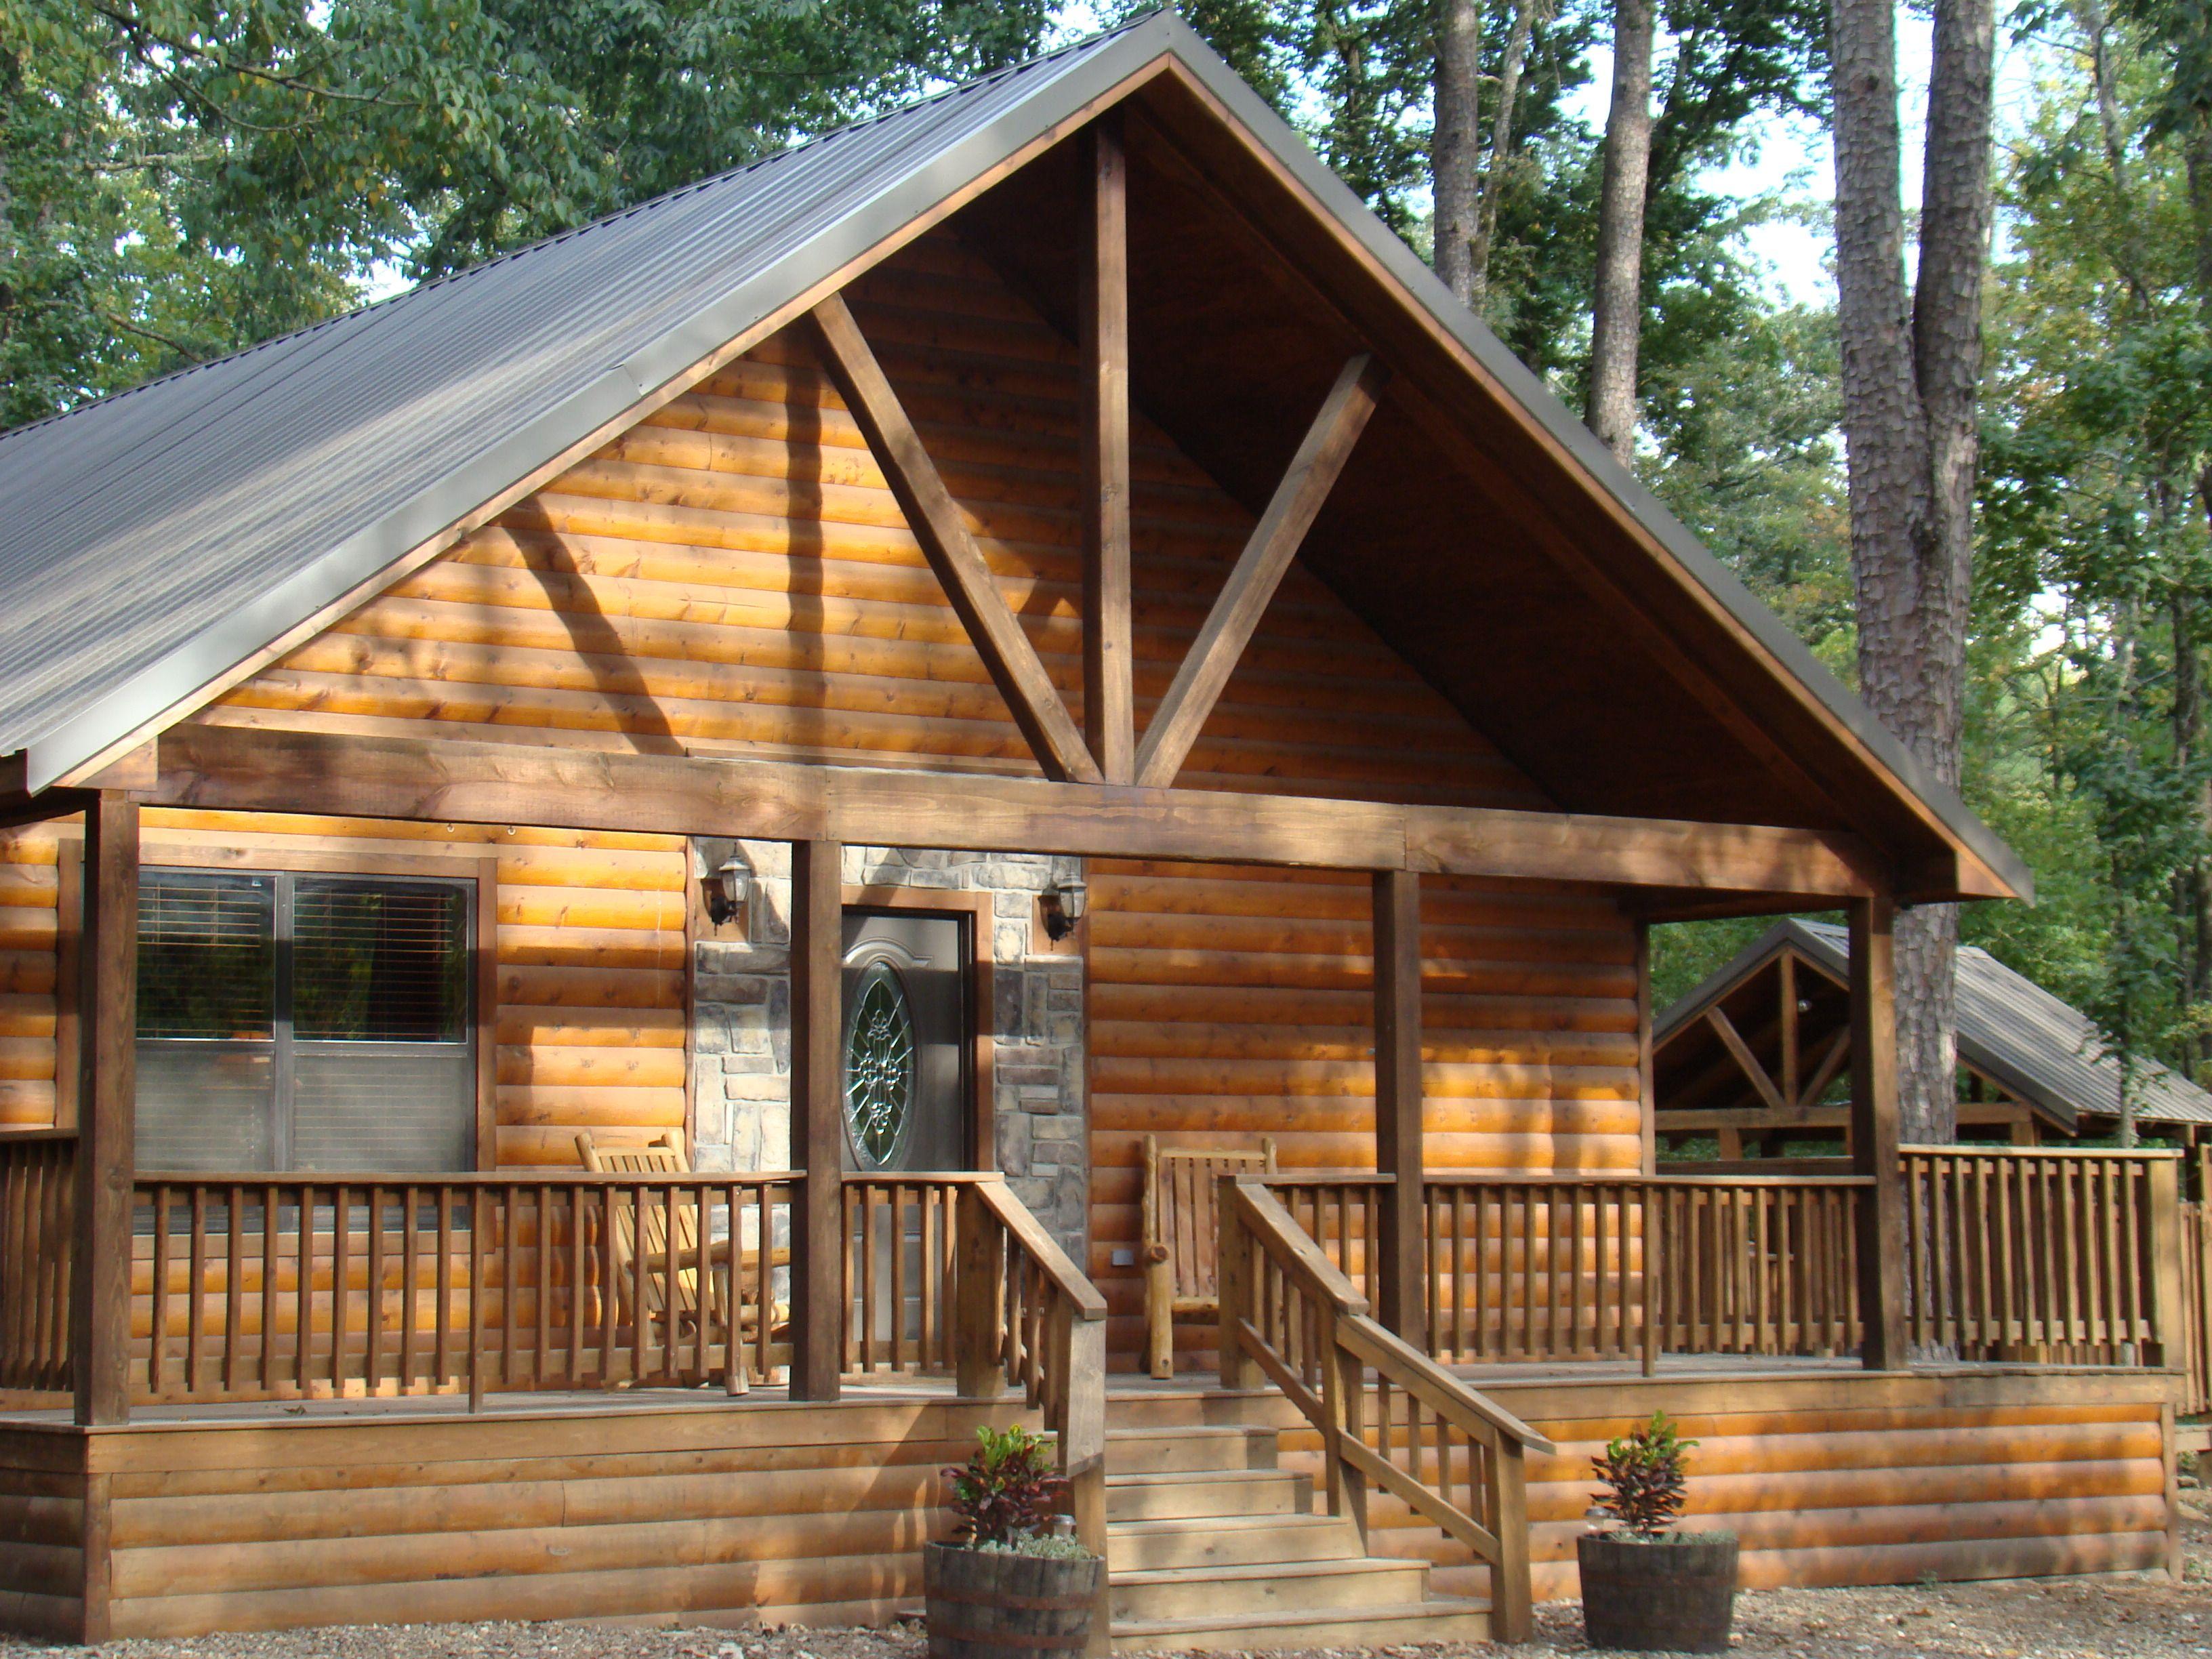 Broken Bow Cabins Beavers Bend Cabins In Oklahoma Luxury Log Cabins Log Cabin Rustic Cabin